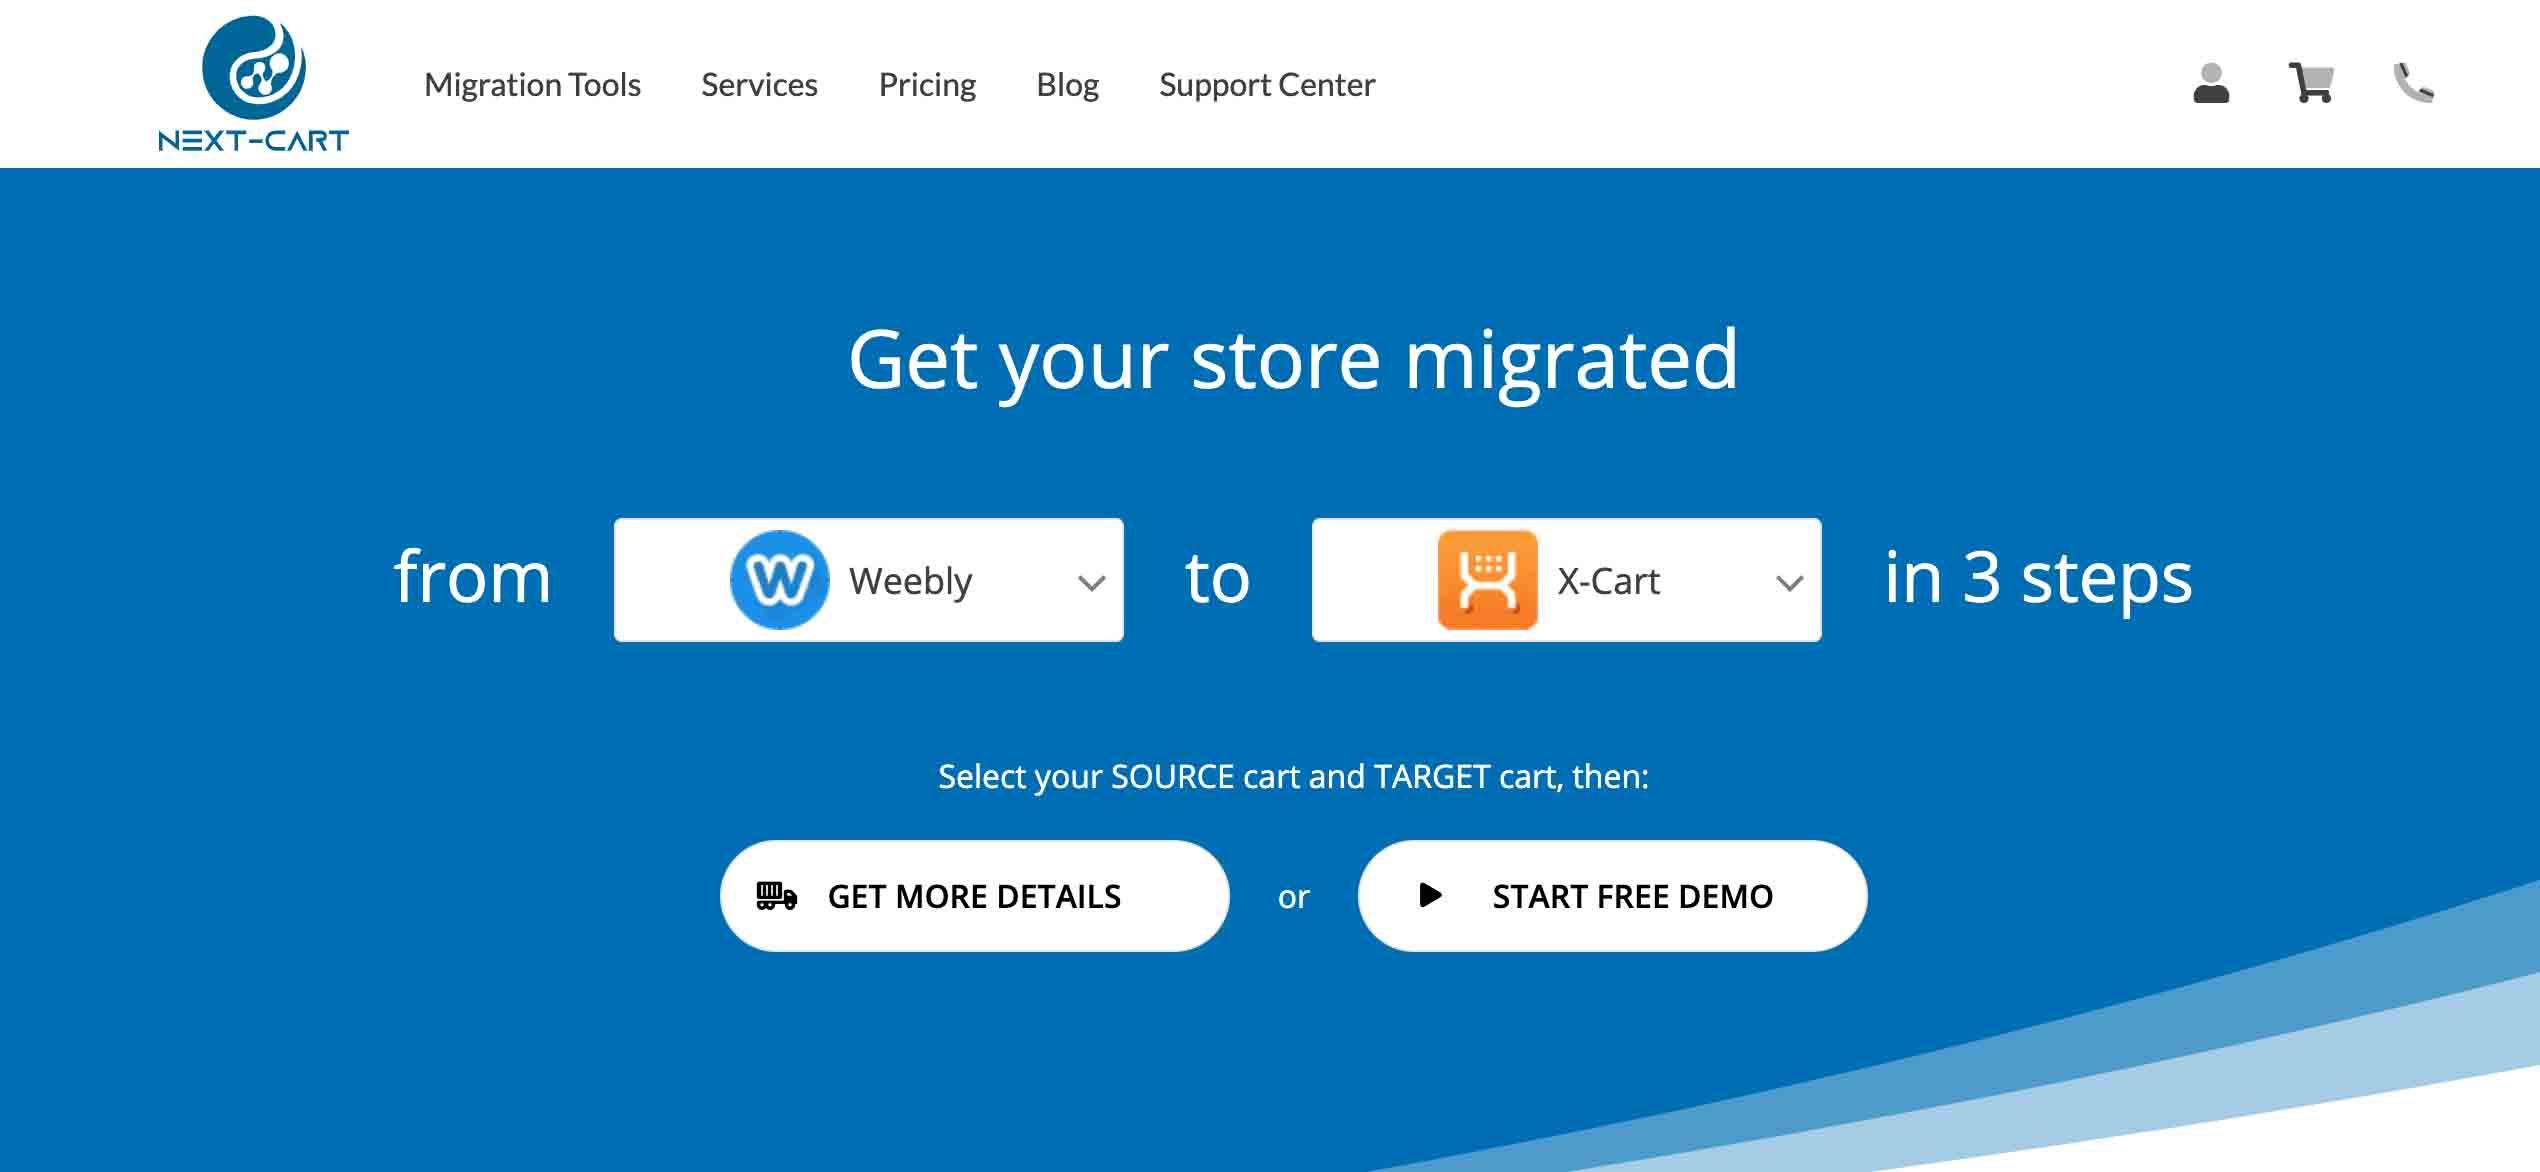 NextCart Shopping Cart Migration Software